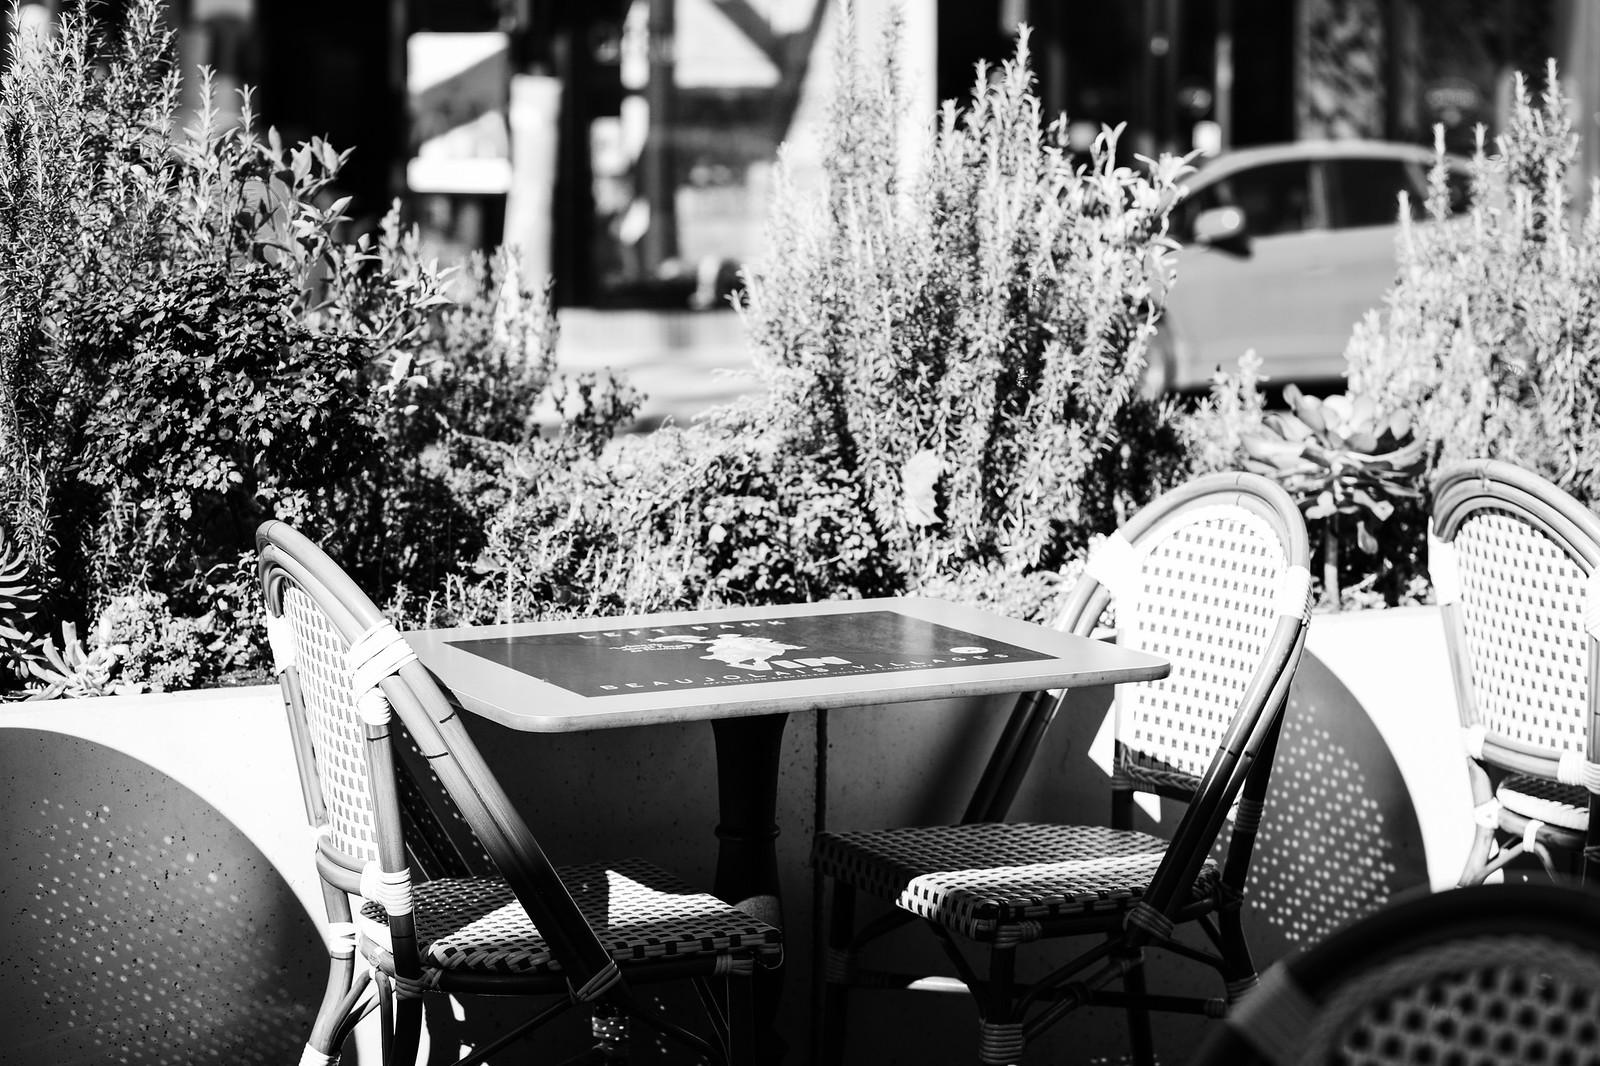 Downtown Menlo Park Blu Skye Media-5140-X3.jpg